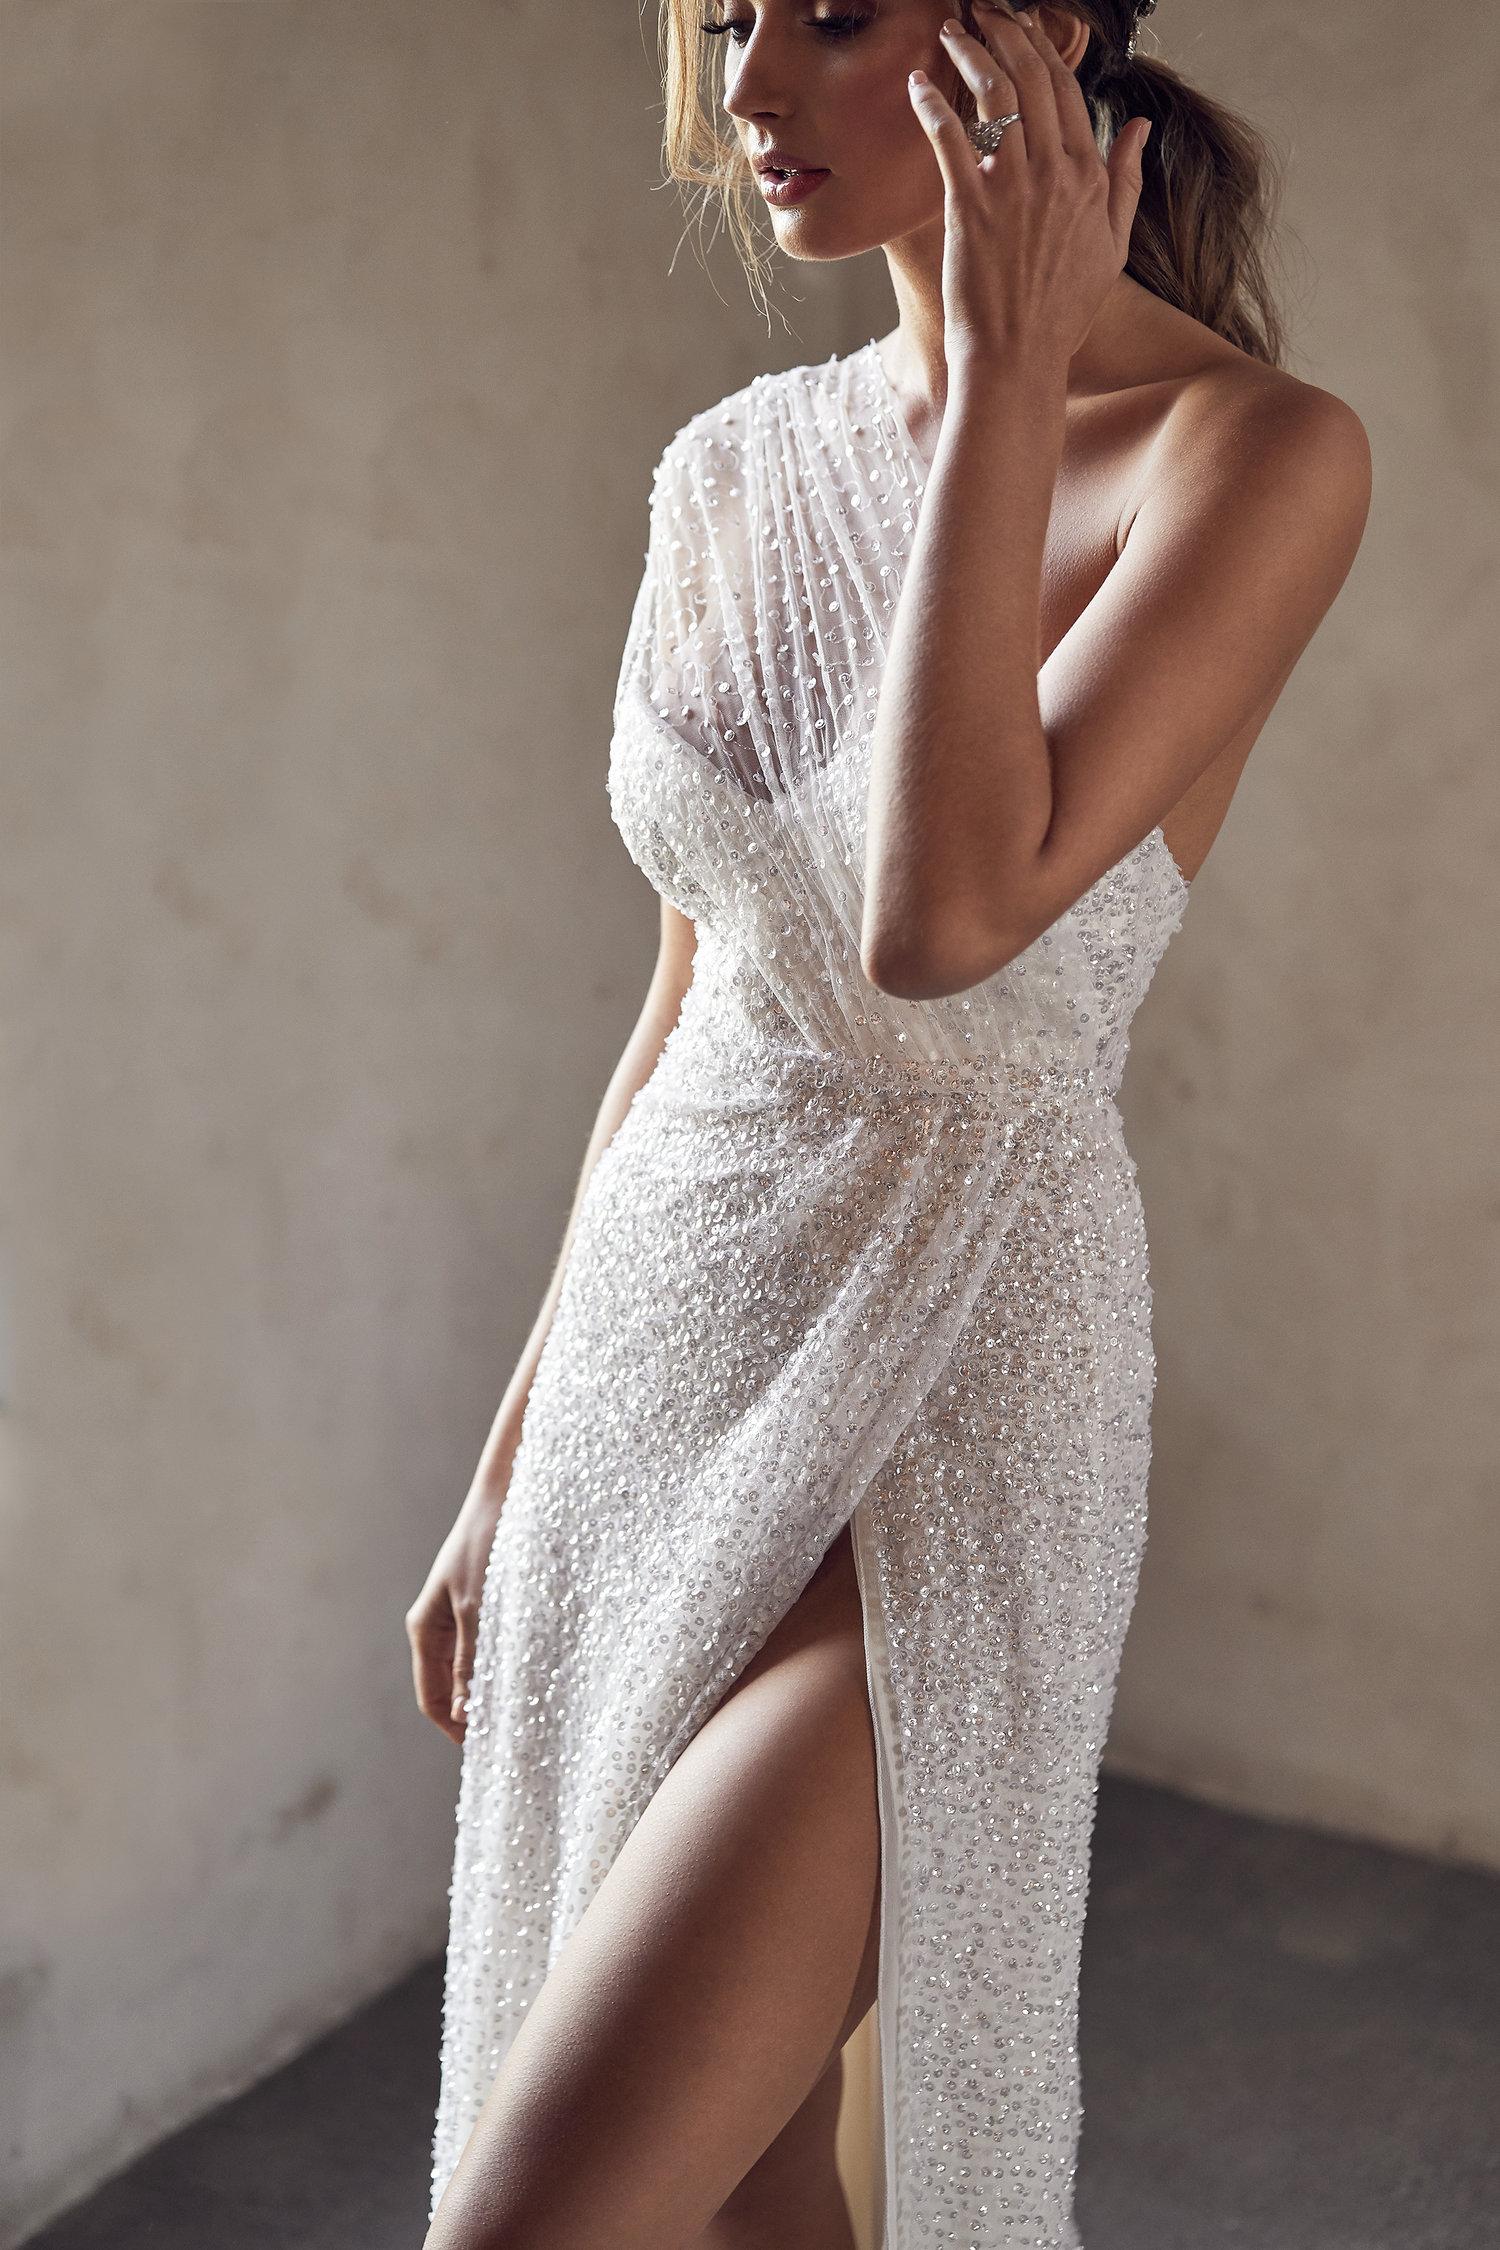 anna-campbell-tate-side-split-wedding-dress